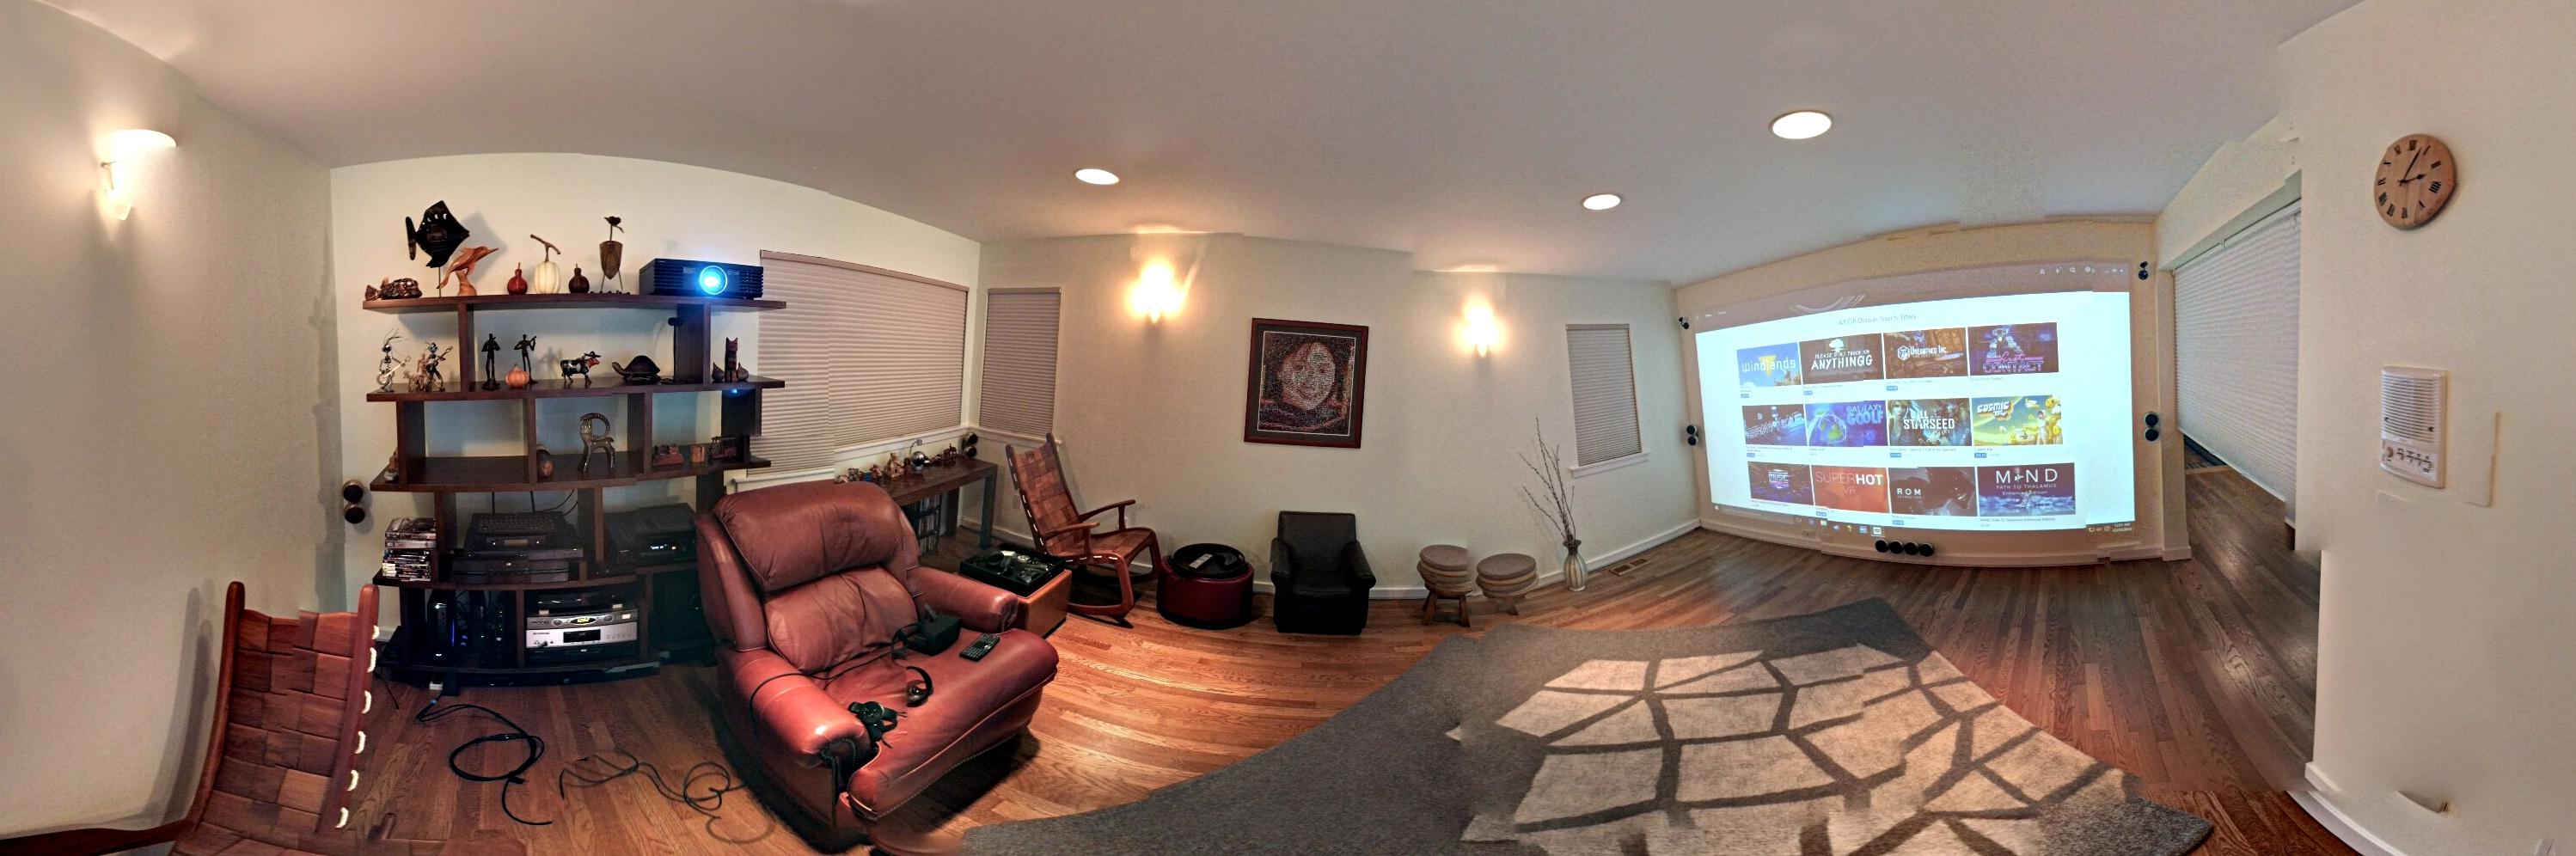 Unusual Oculus Roomscale Setup Xinhai Dude 辛亥生網誌